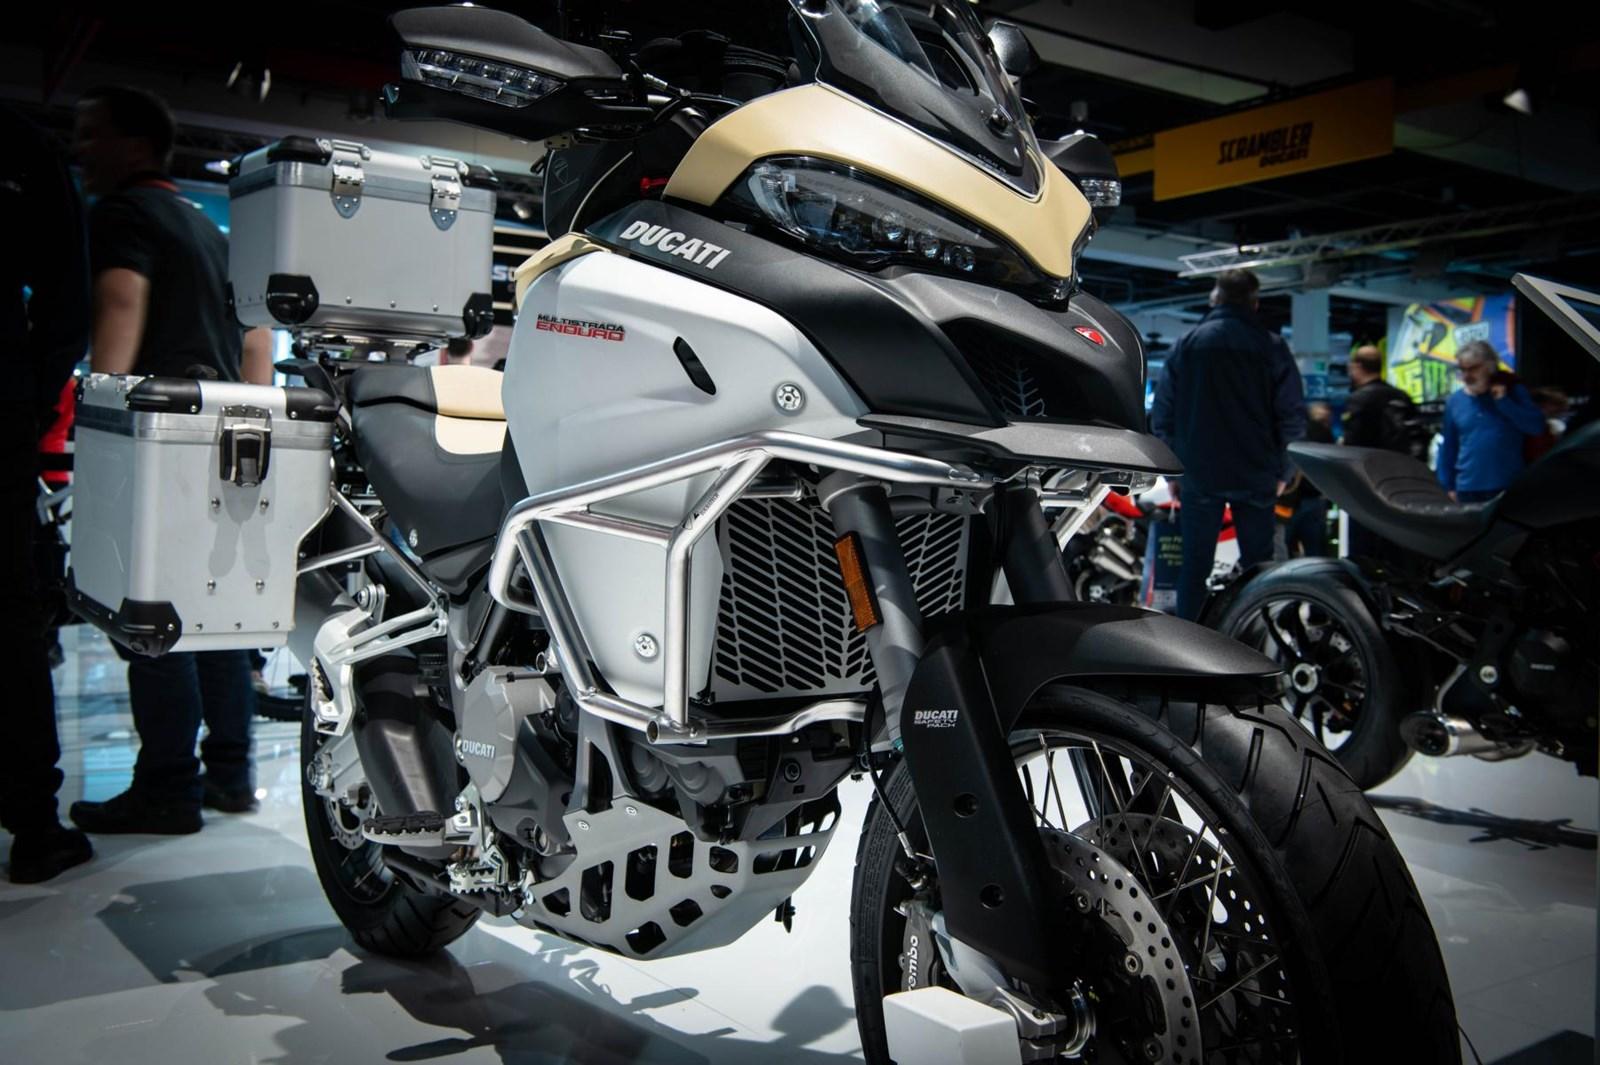 Ducati_Multistrada 1260 Enduro (2 von 10)-39.JPG